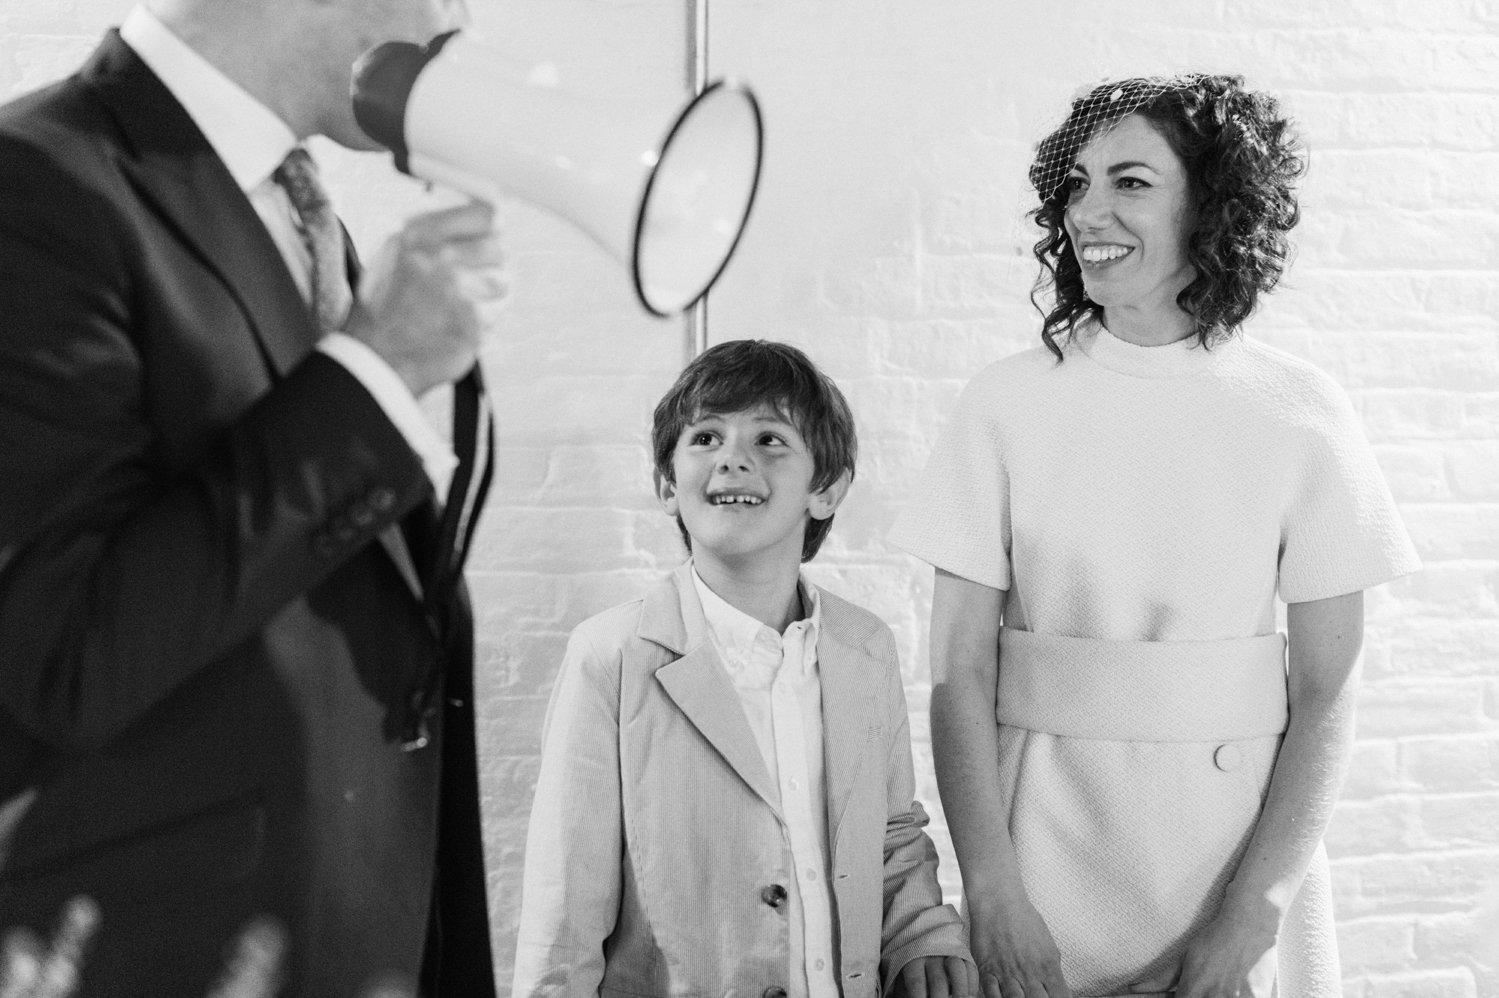 brixton east wedding photographer-31